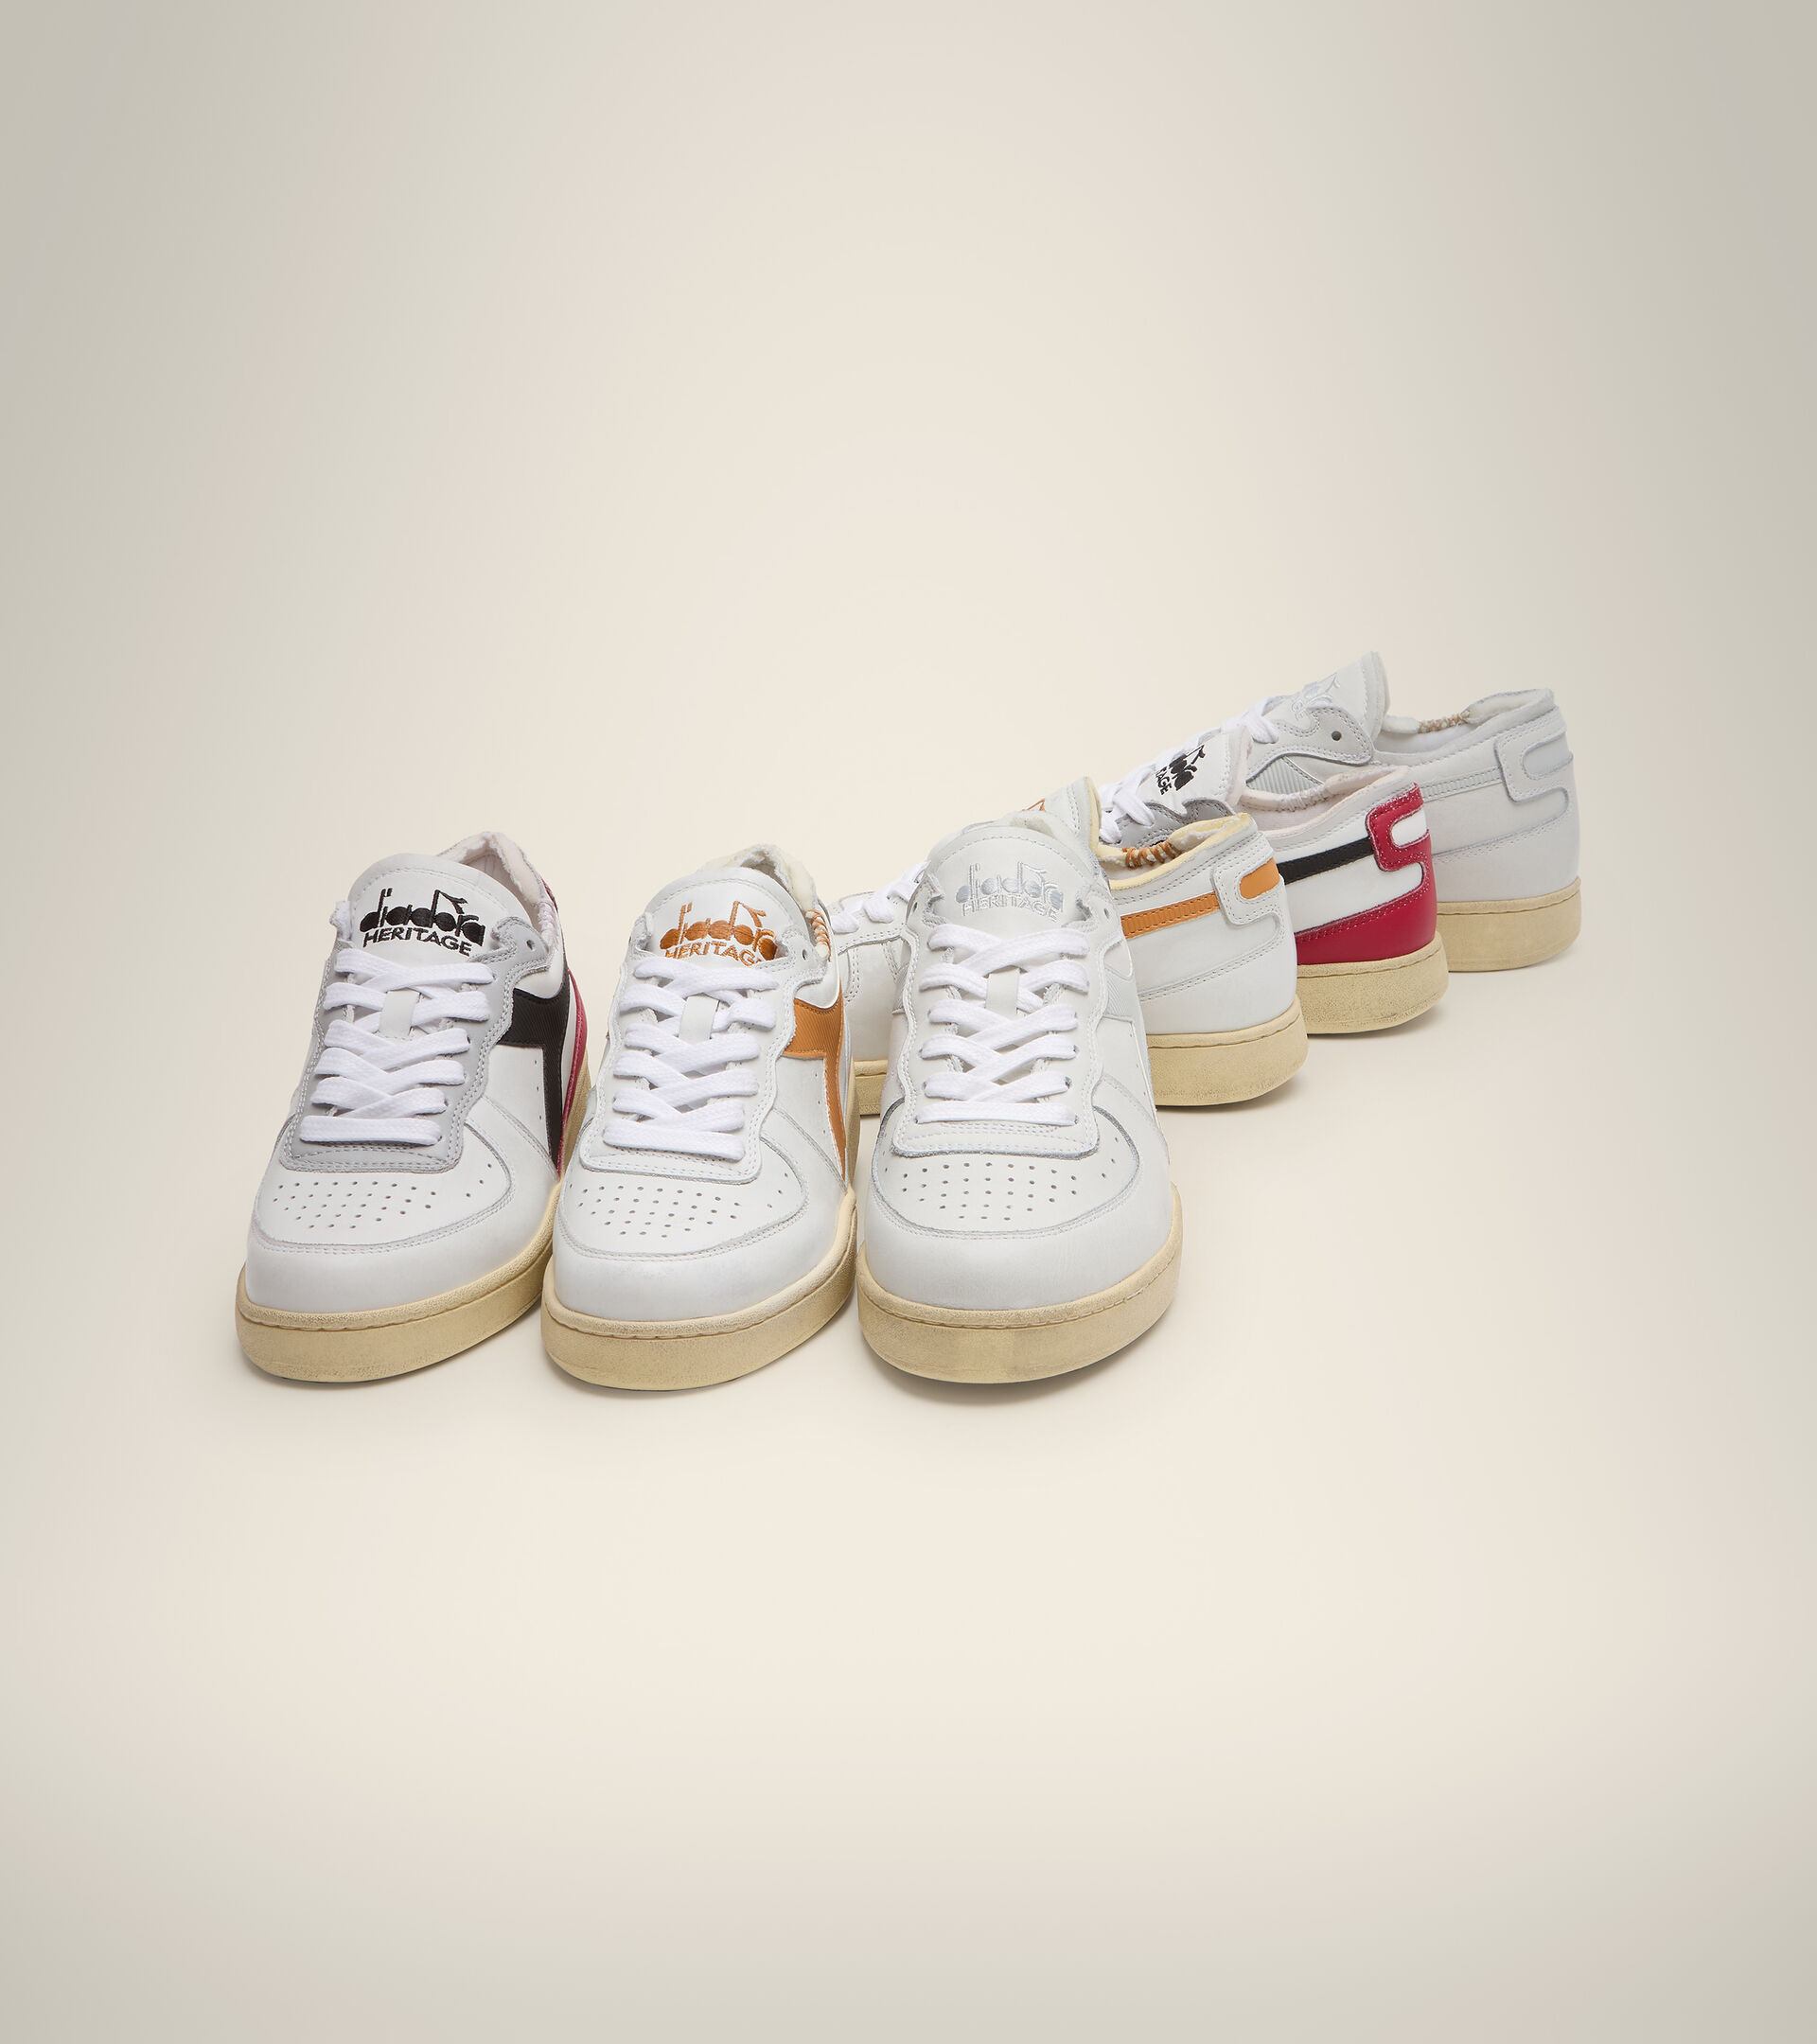 Heritage-Schuh - Unisex MI BASKET ROW CUT WEISS/NUGGET - Diadora